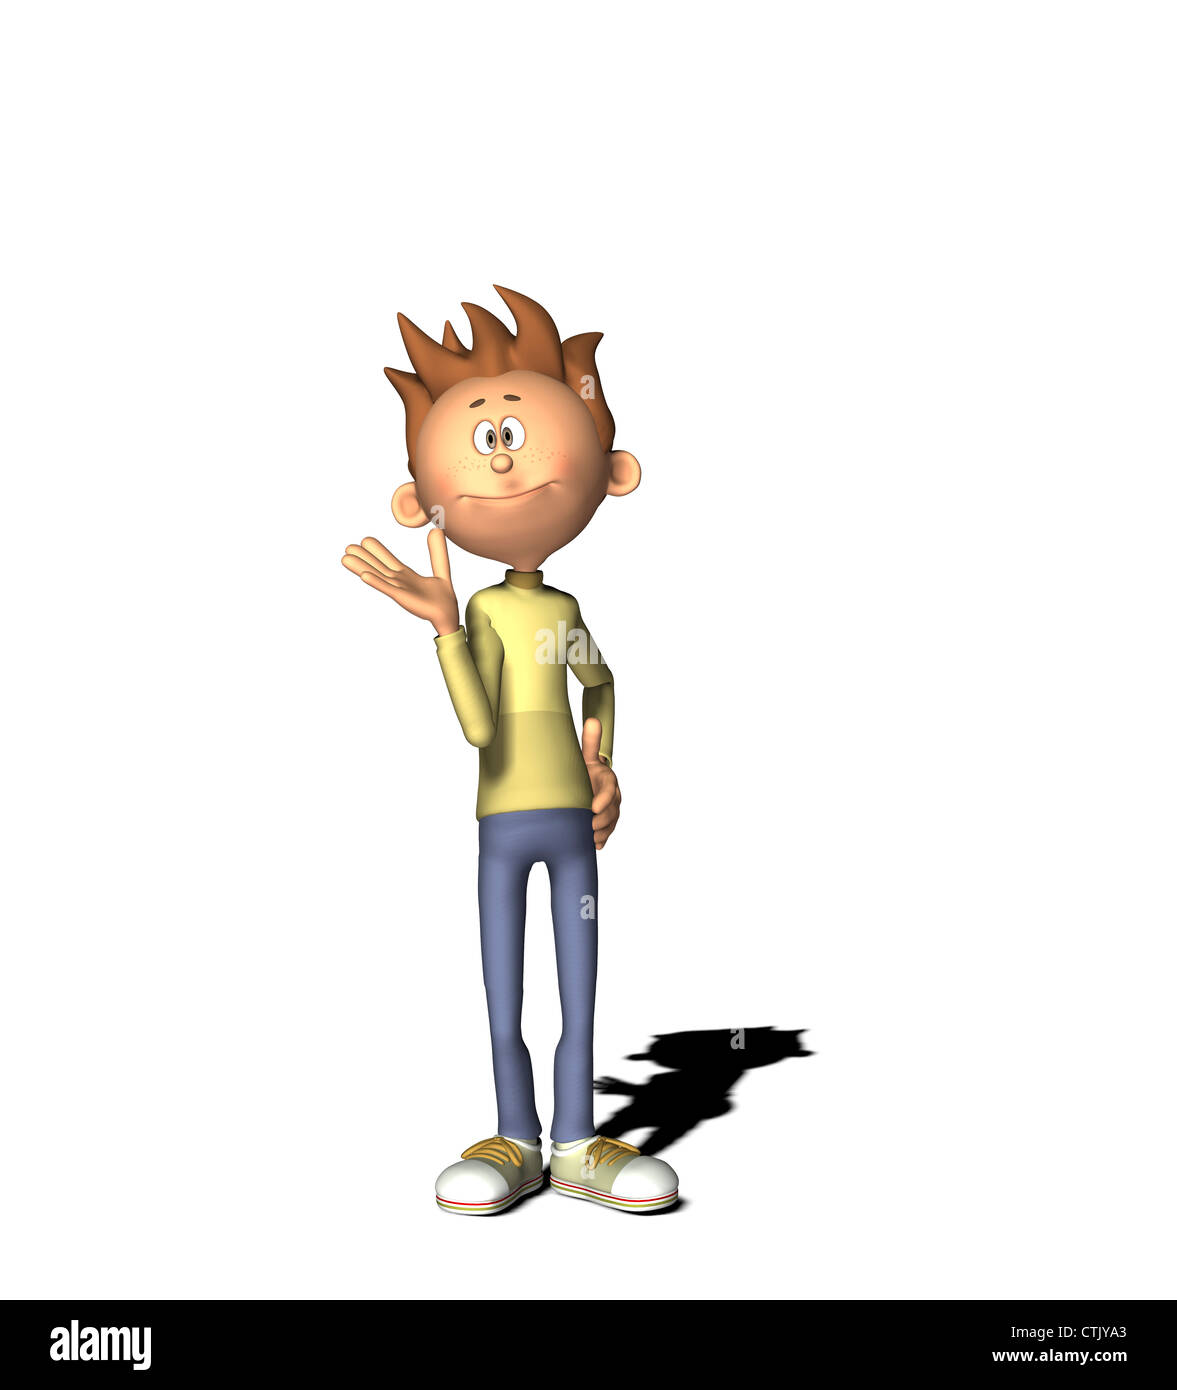 cartoon figure boy - Stock Image